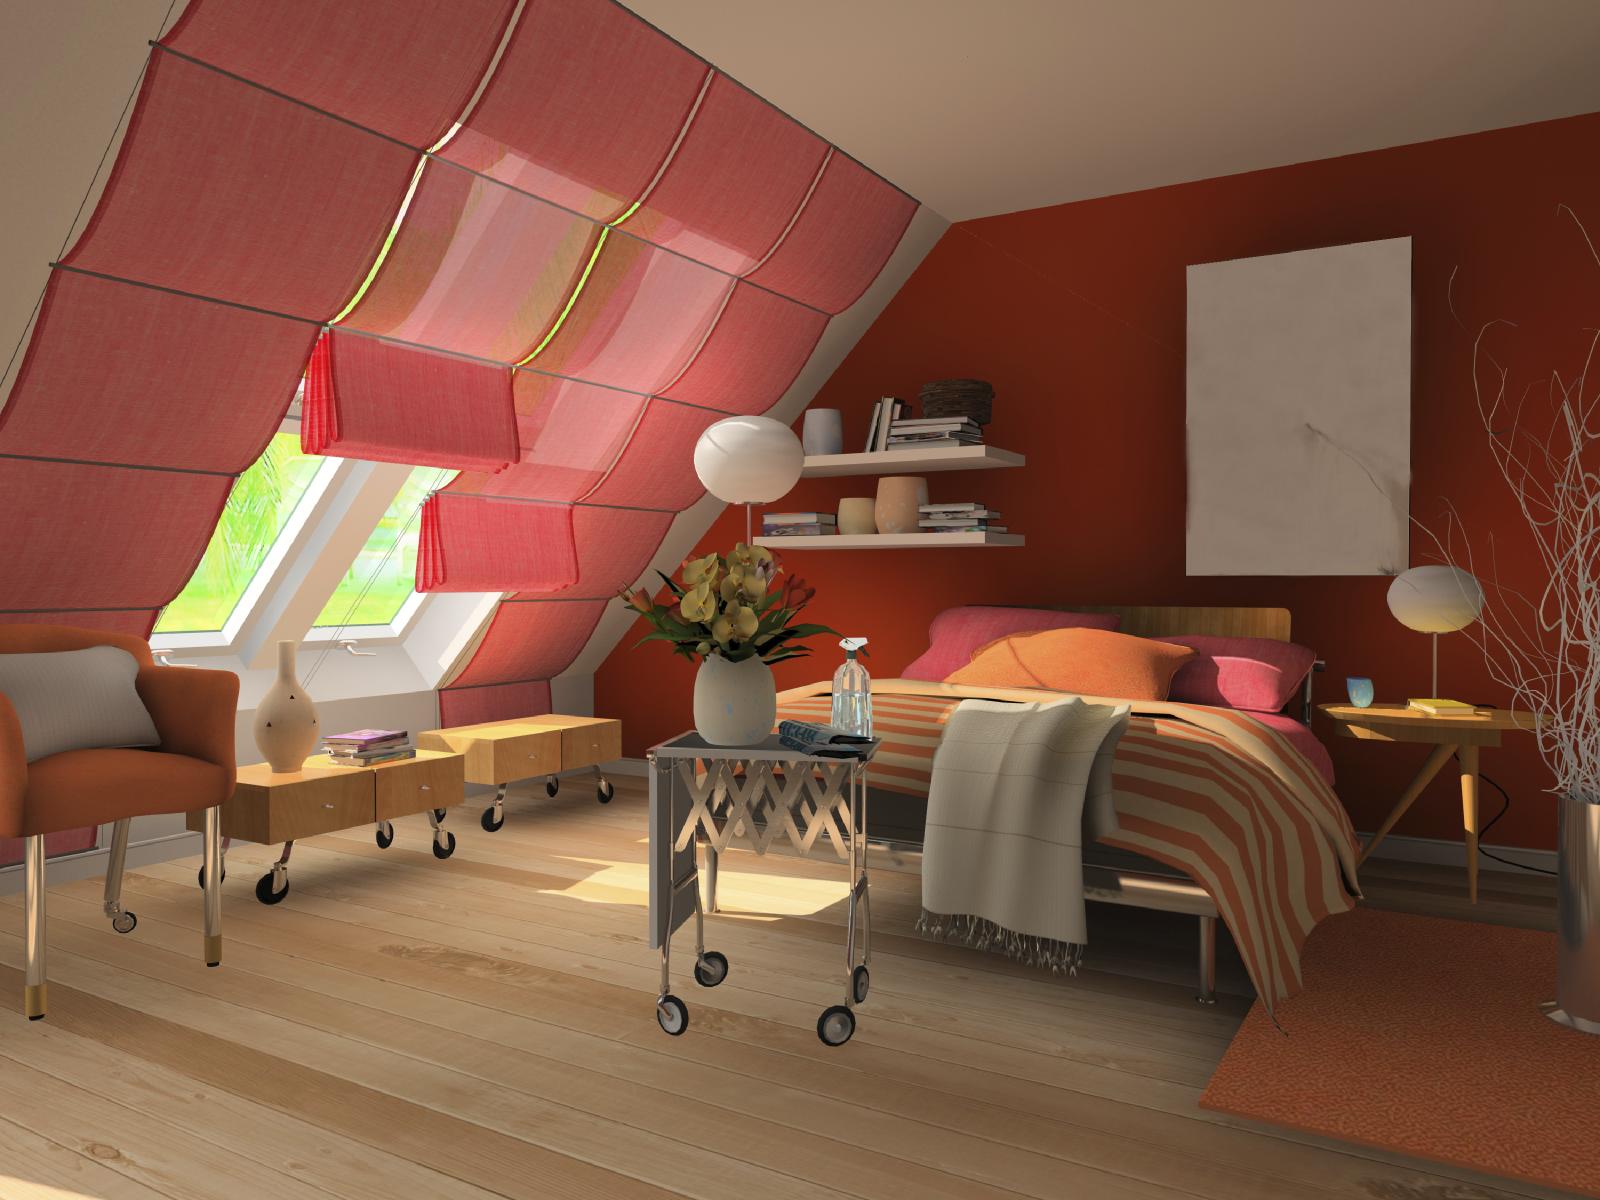 simple-attic-room-remodeling-ideas